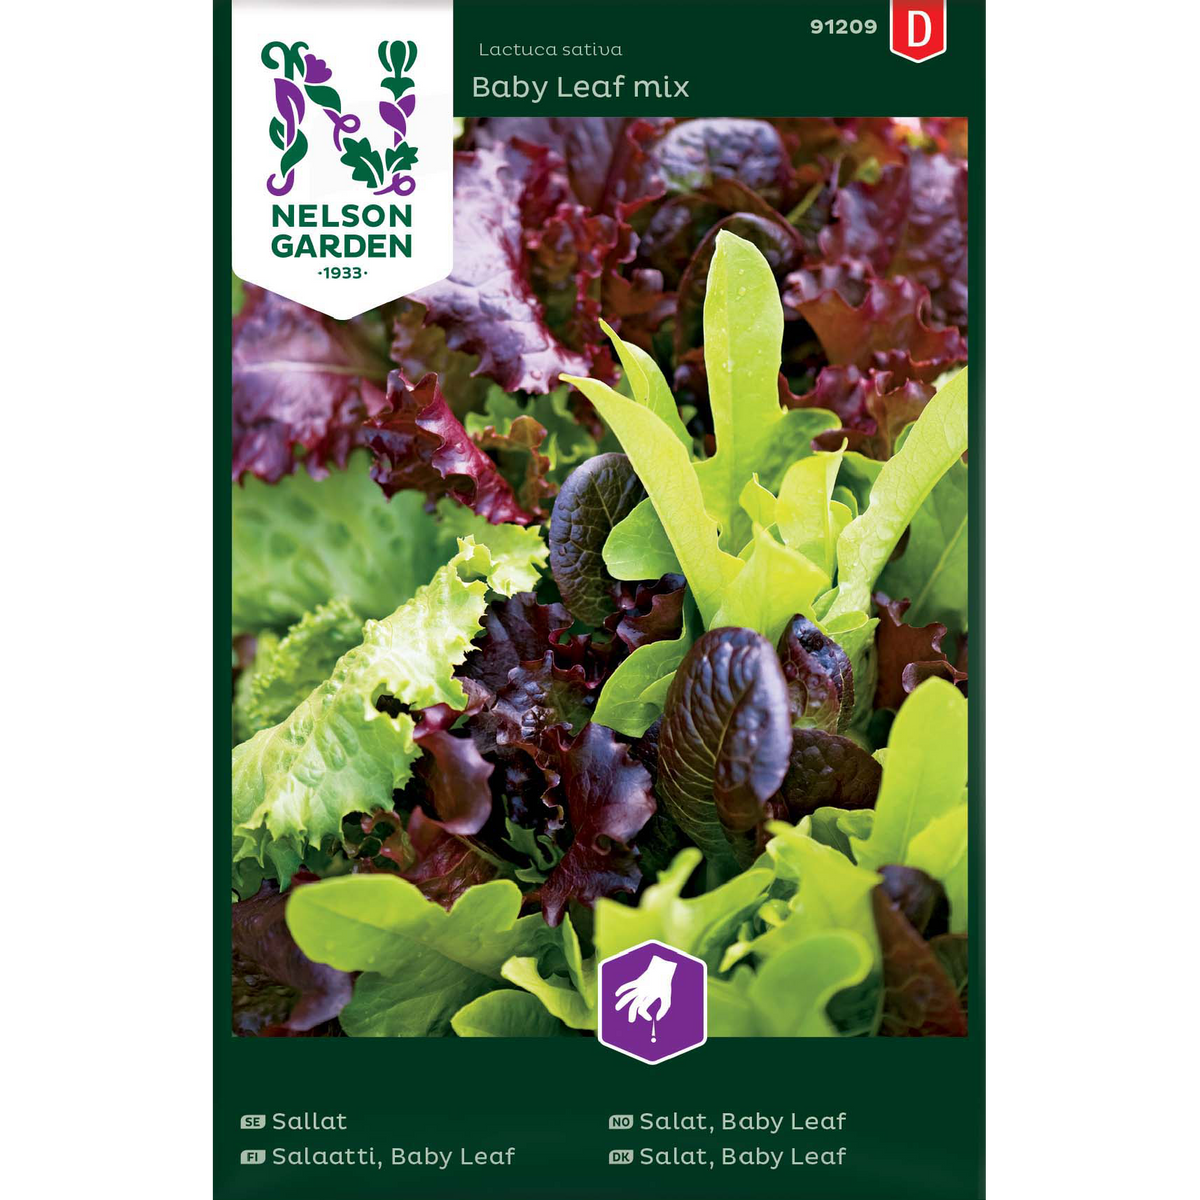 Salat, Baby Leaf mix